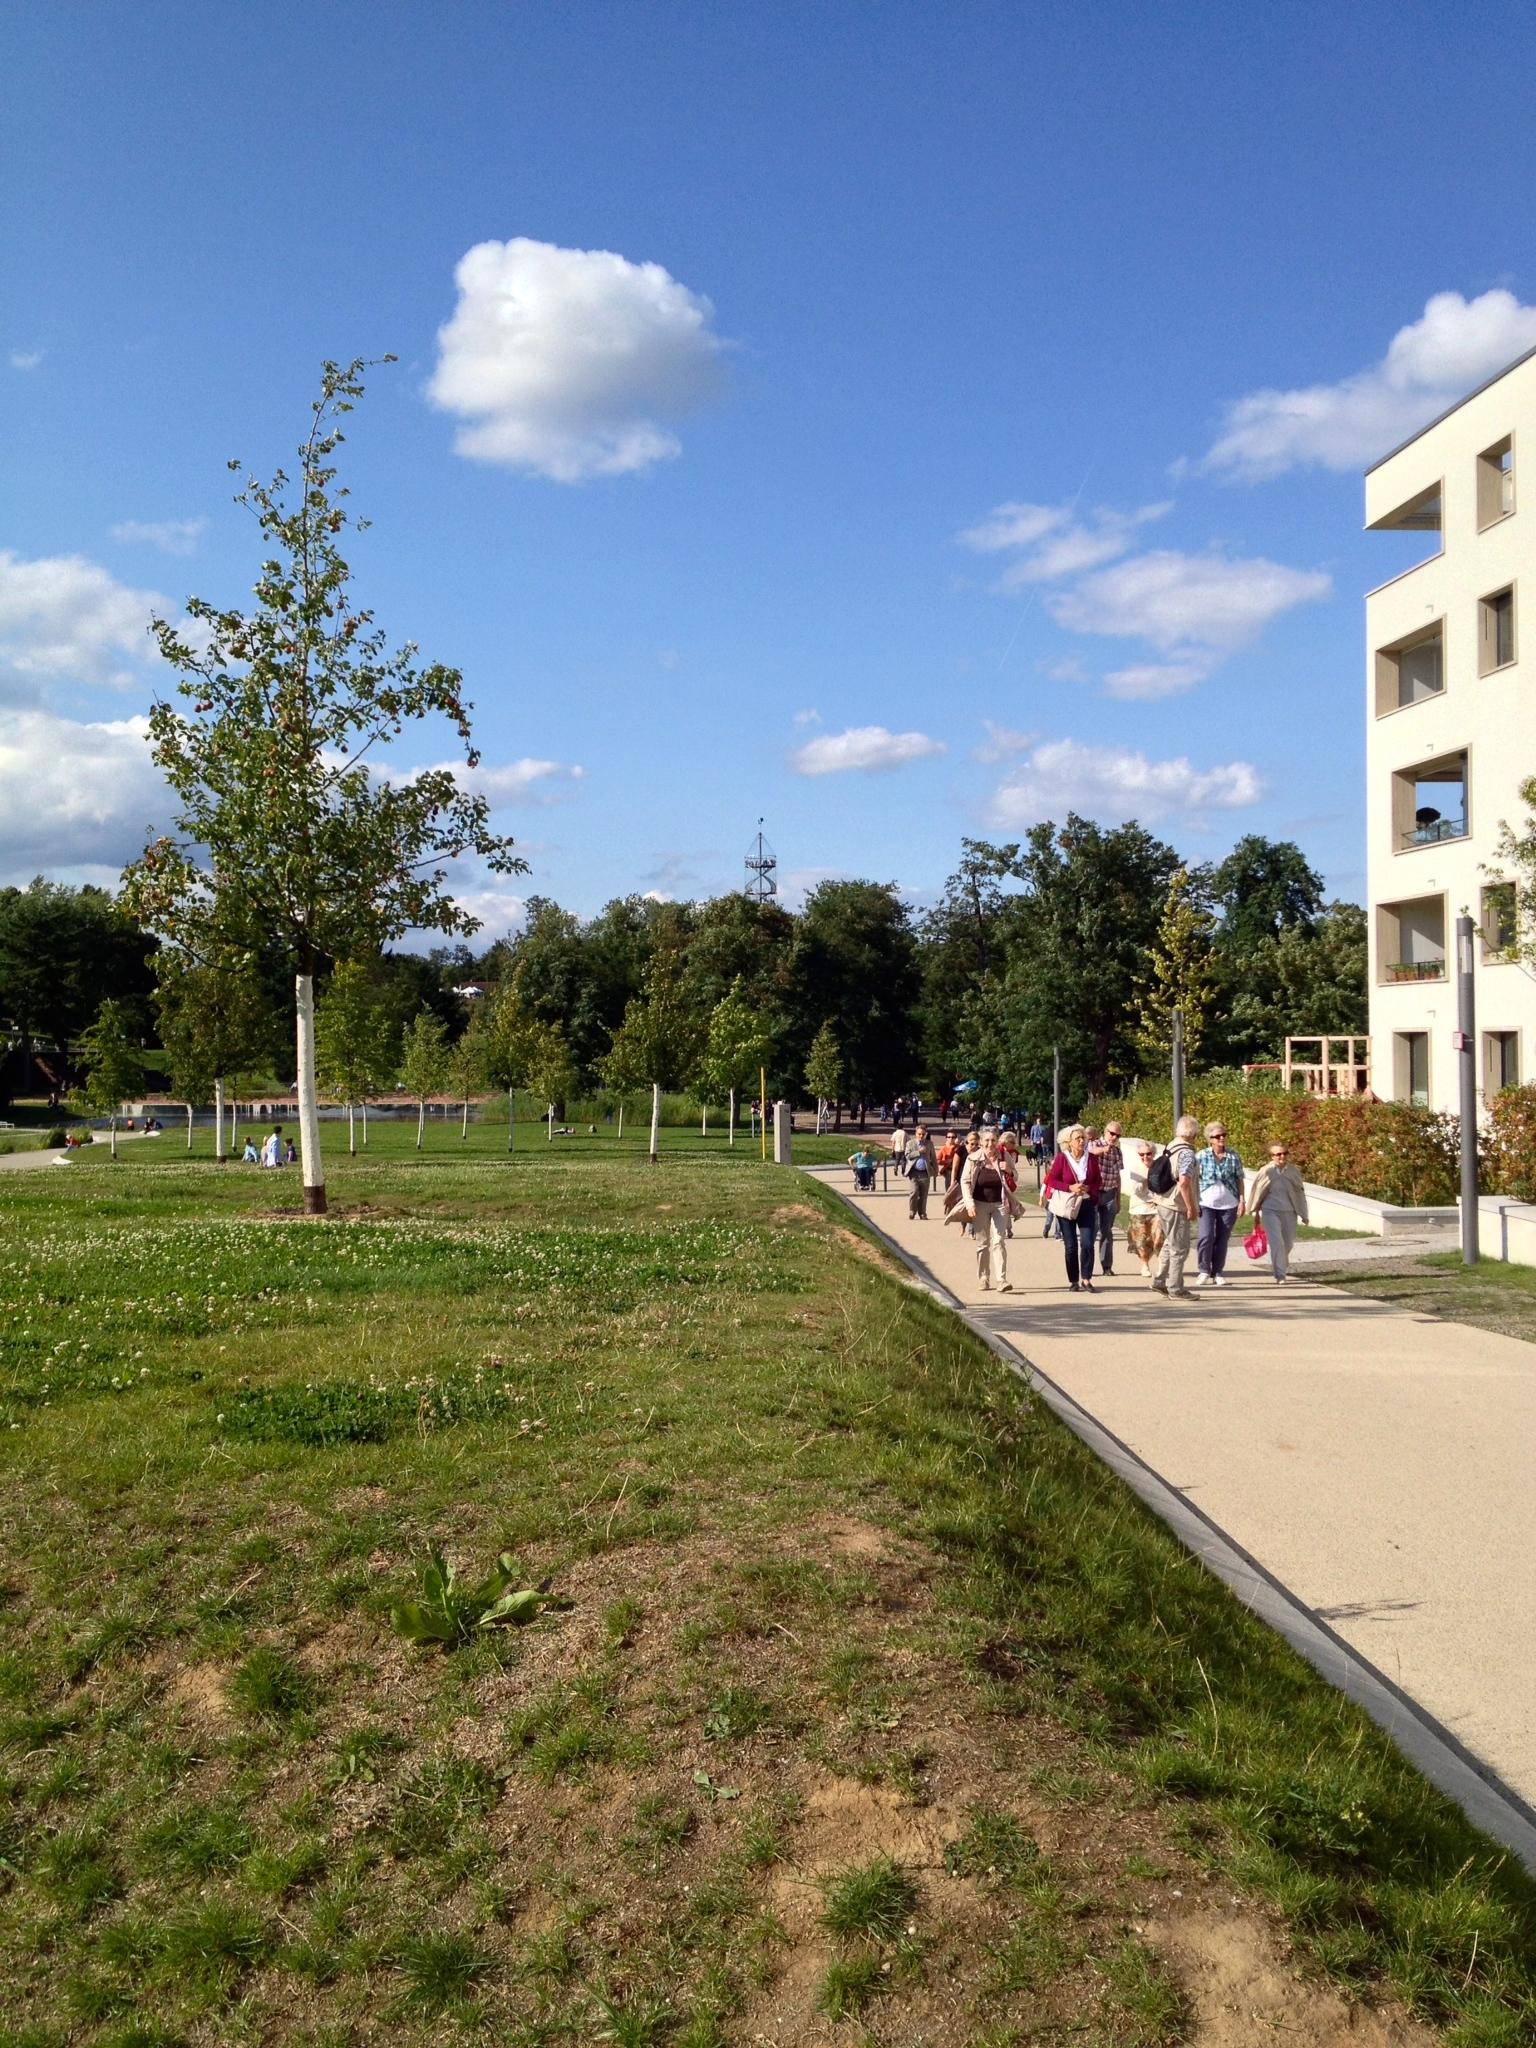 Walking the path up to  Killesbergpark